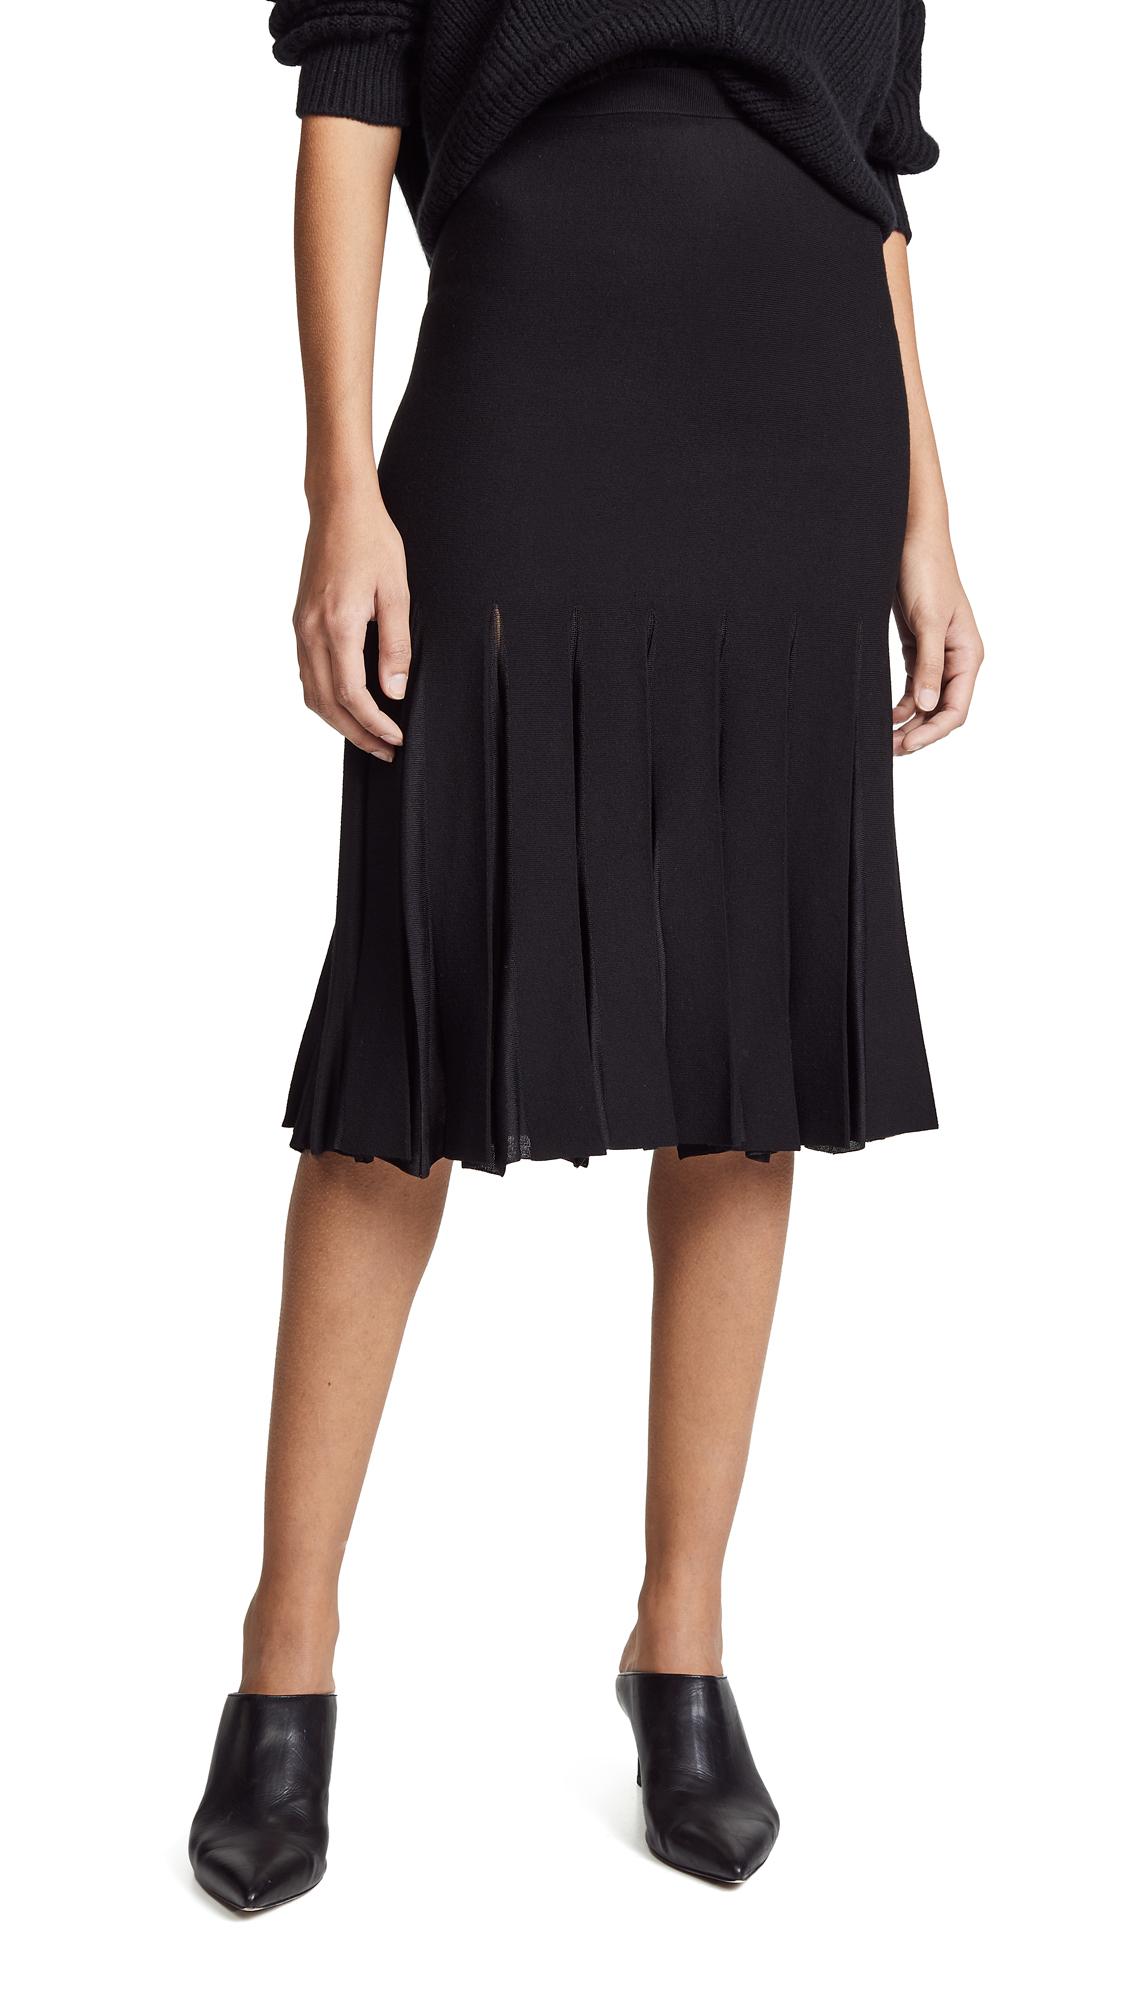 Theory Pleated Skirt - Black/Black